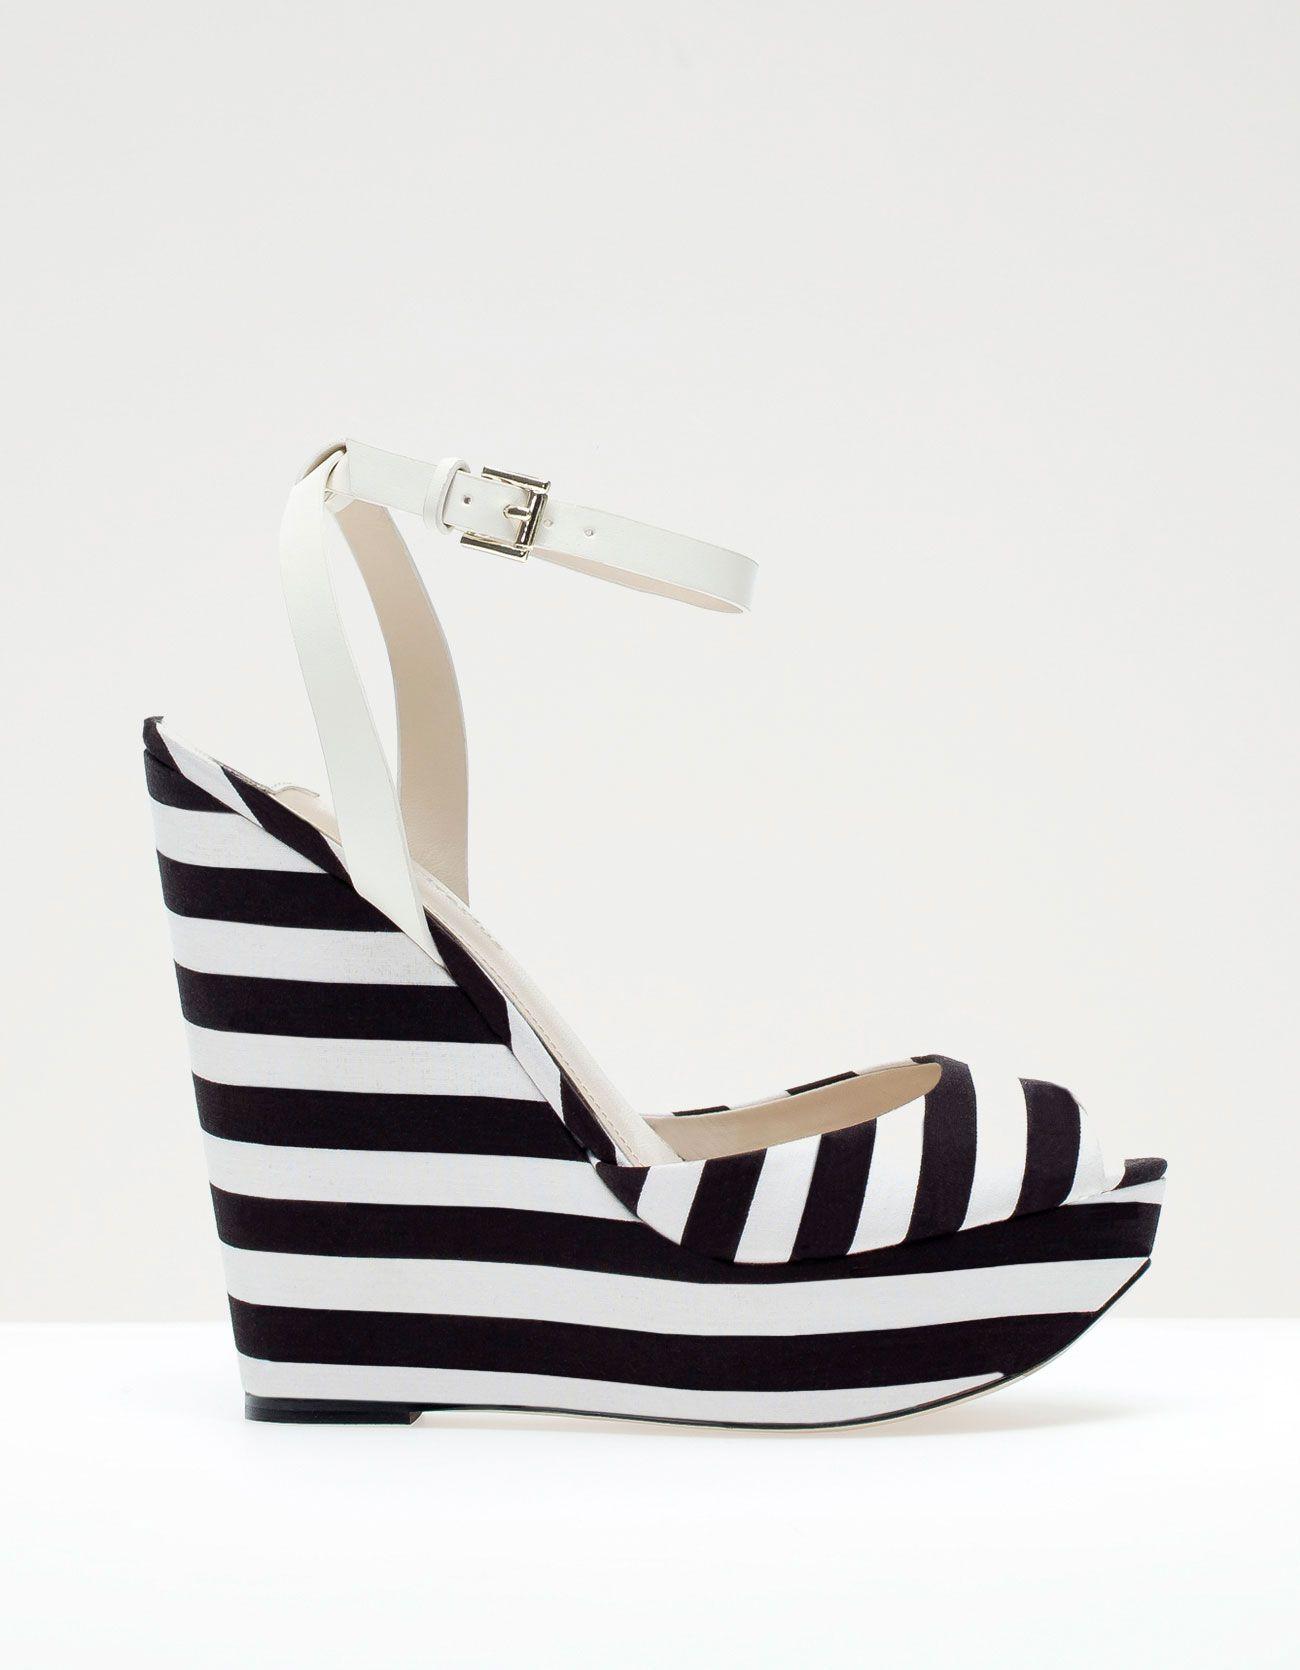 Stradivarius Espana Tienda Online Pretty Shoes Shoe Inspiration Shoe Obsession